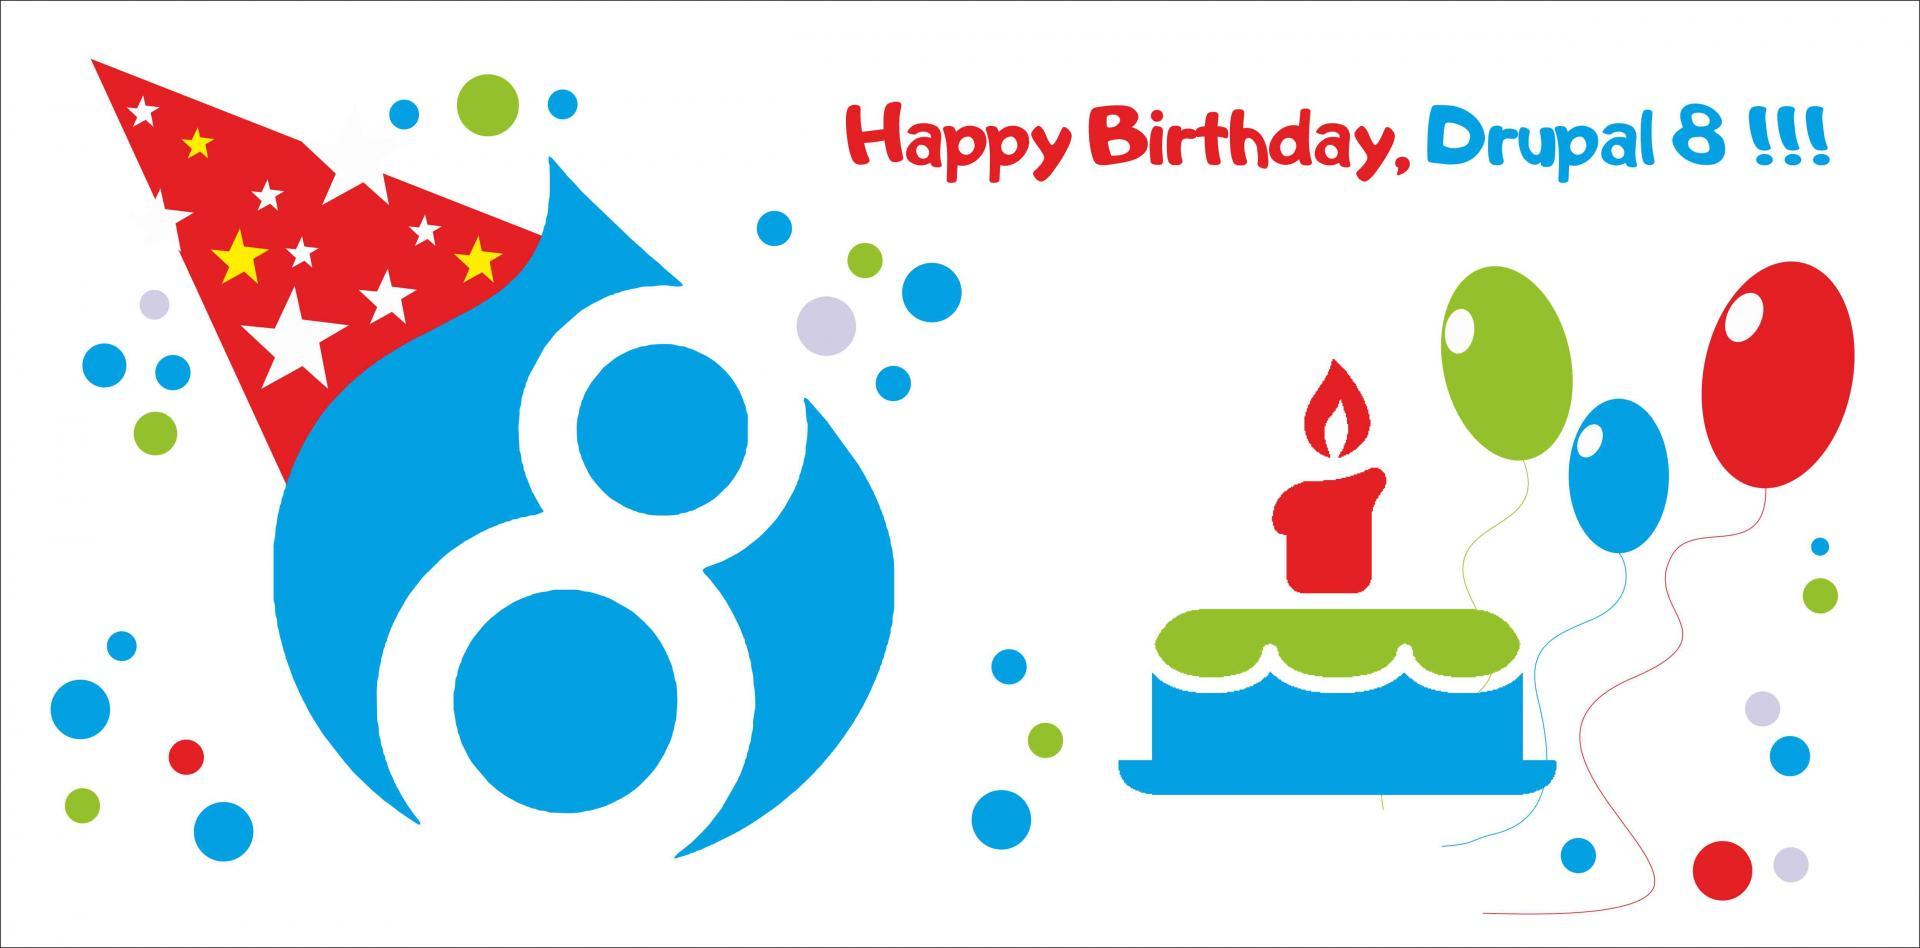 Drupal 8 released, happy birthday! | Blog Drudesk